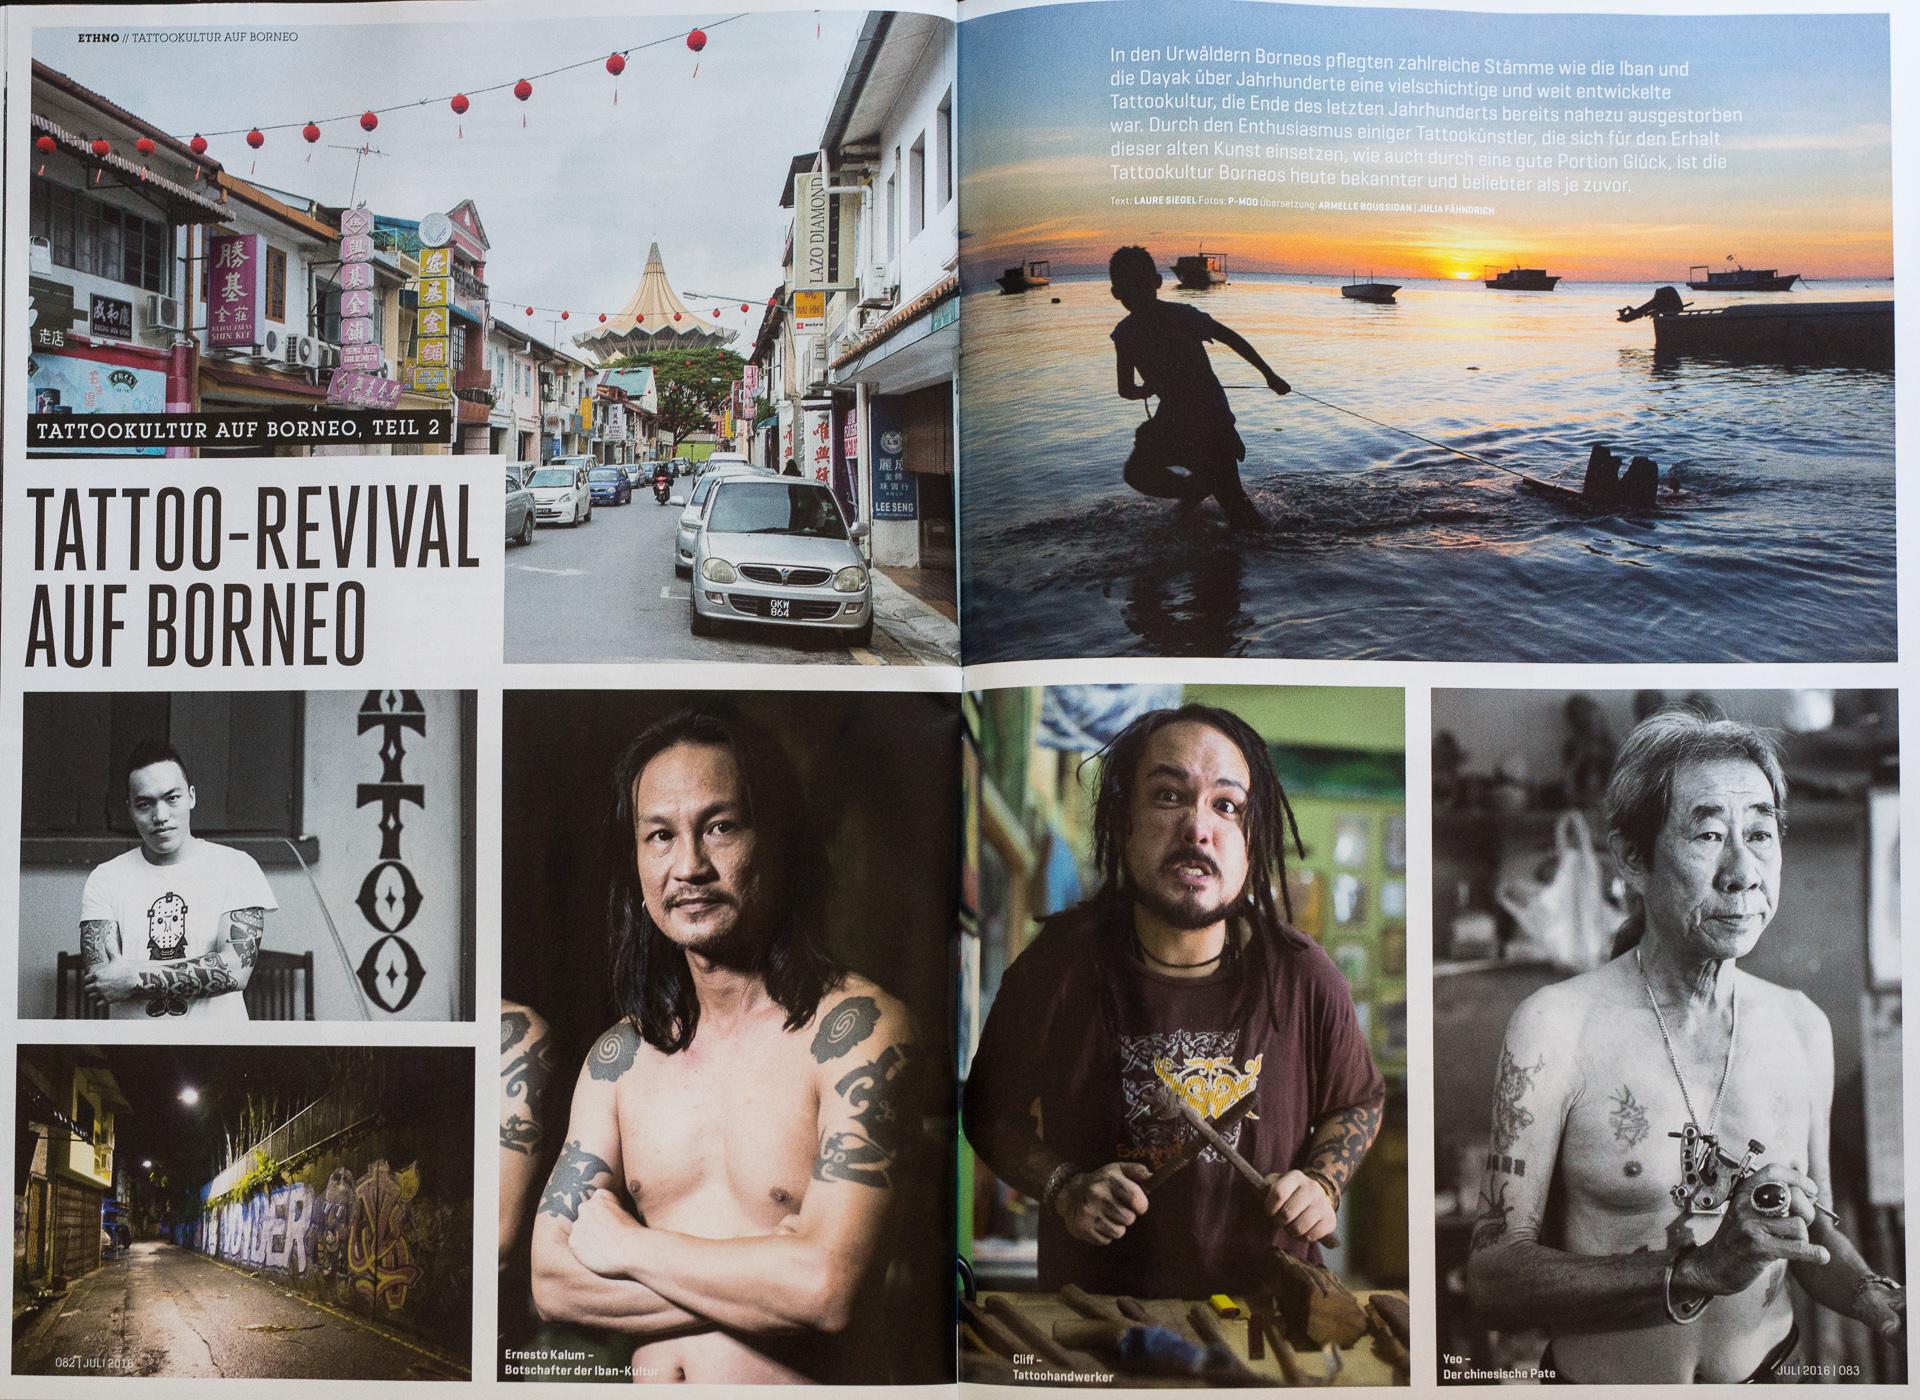 Tätowier 2016 - Tattoo revival of Borneo